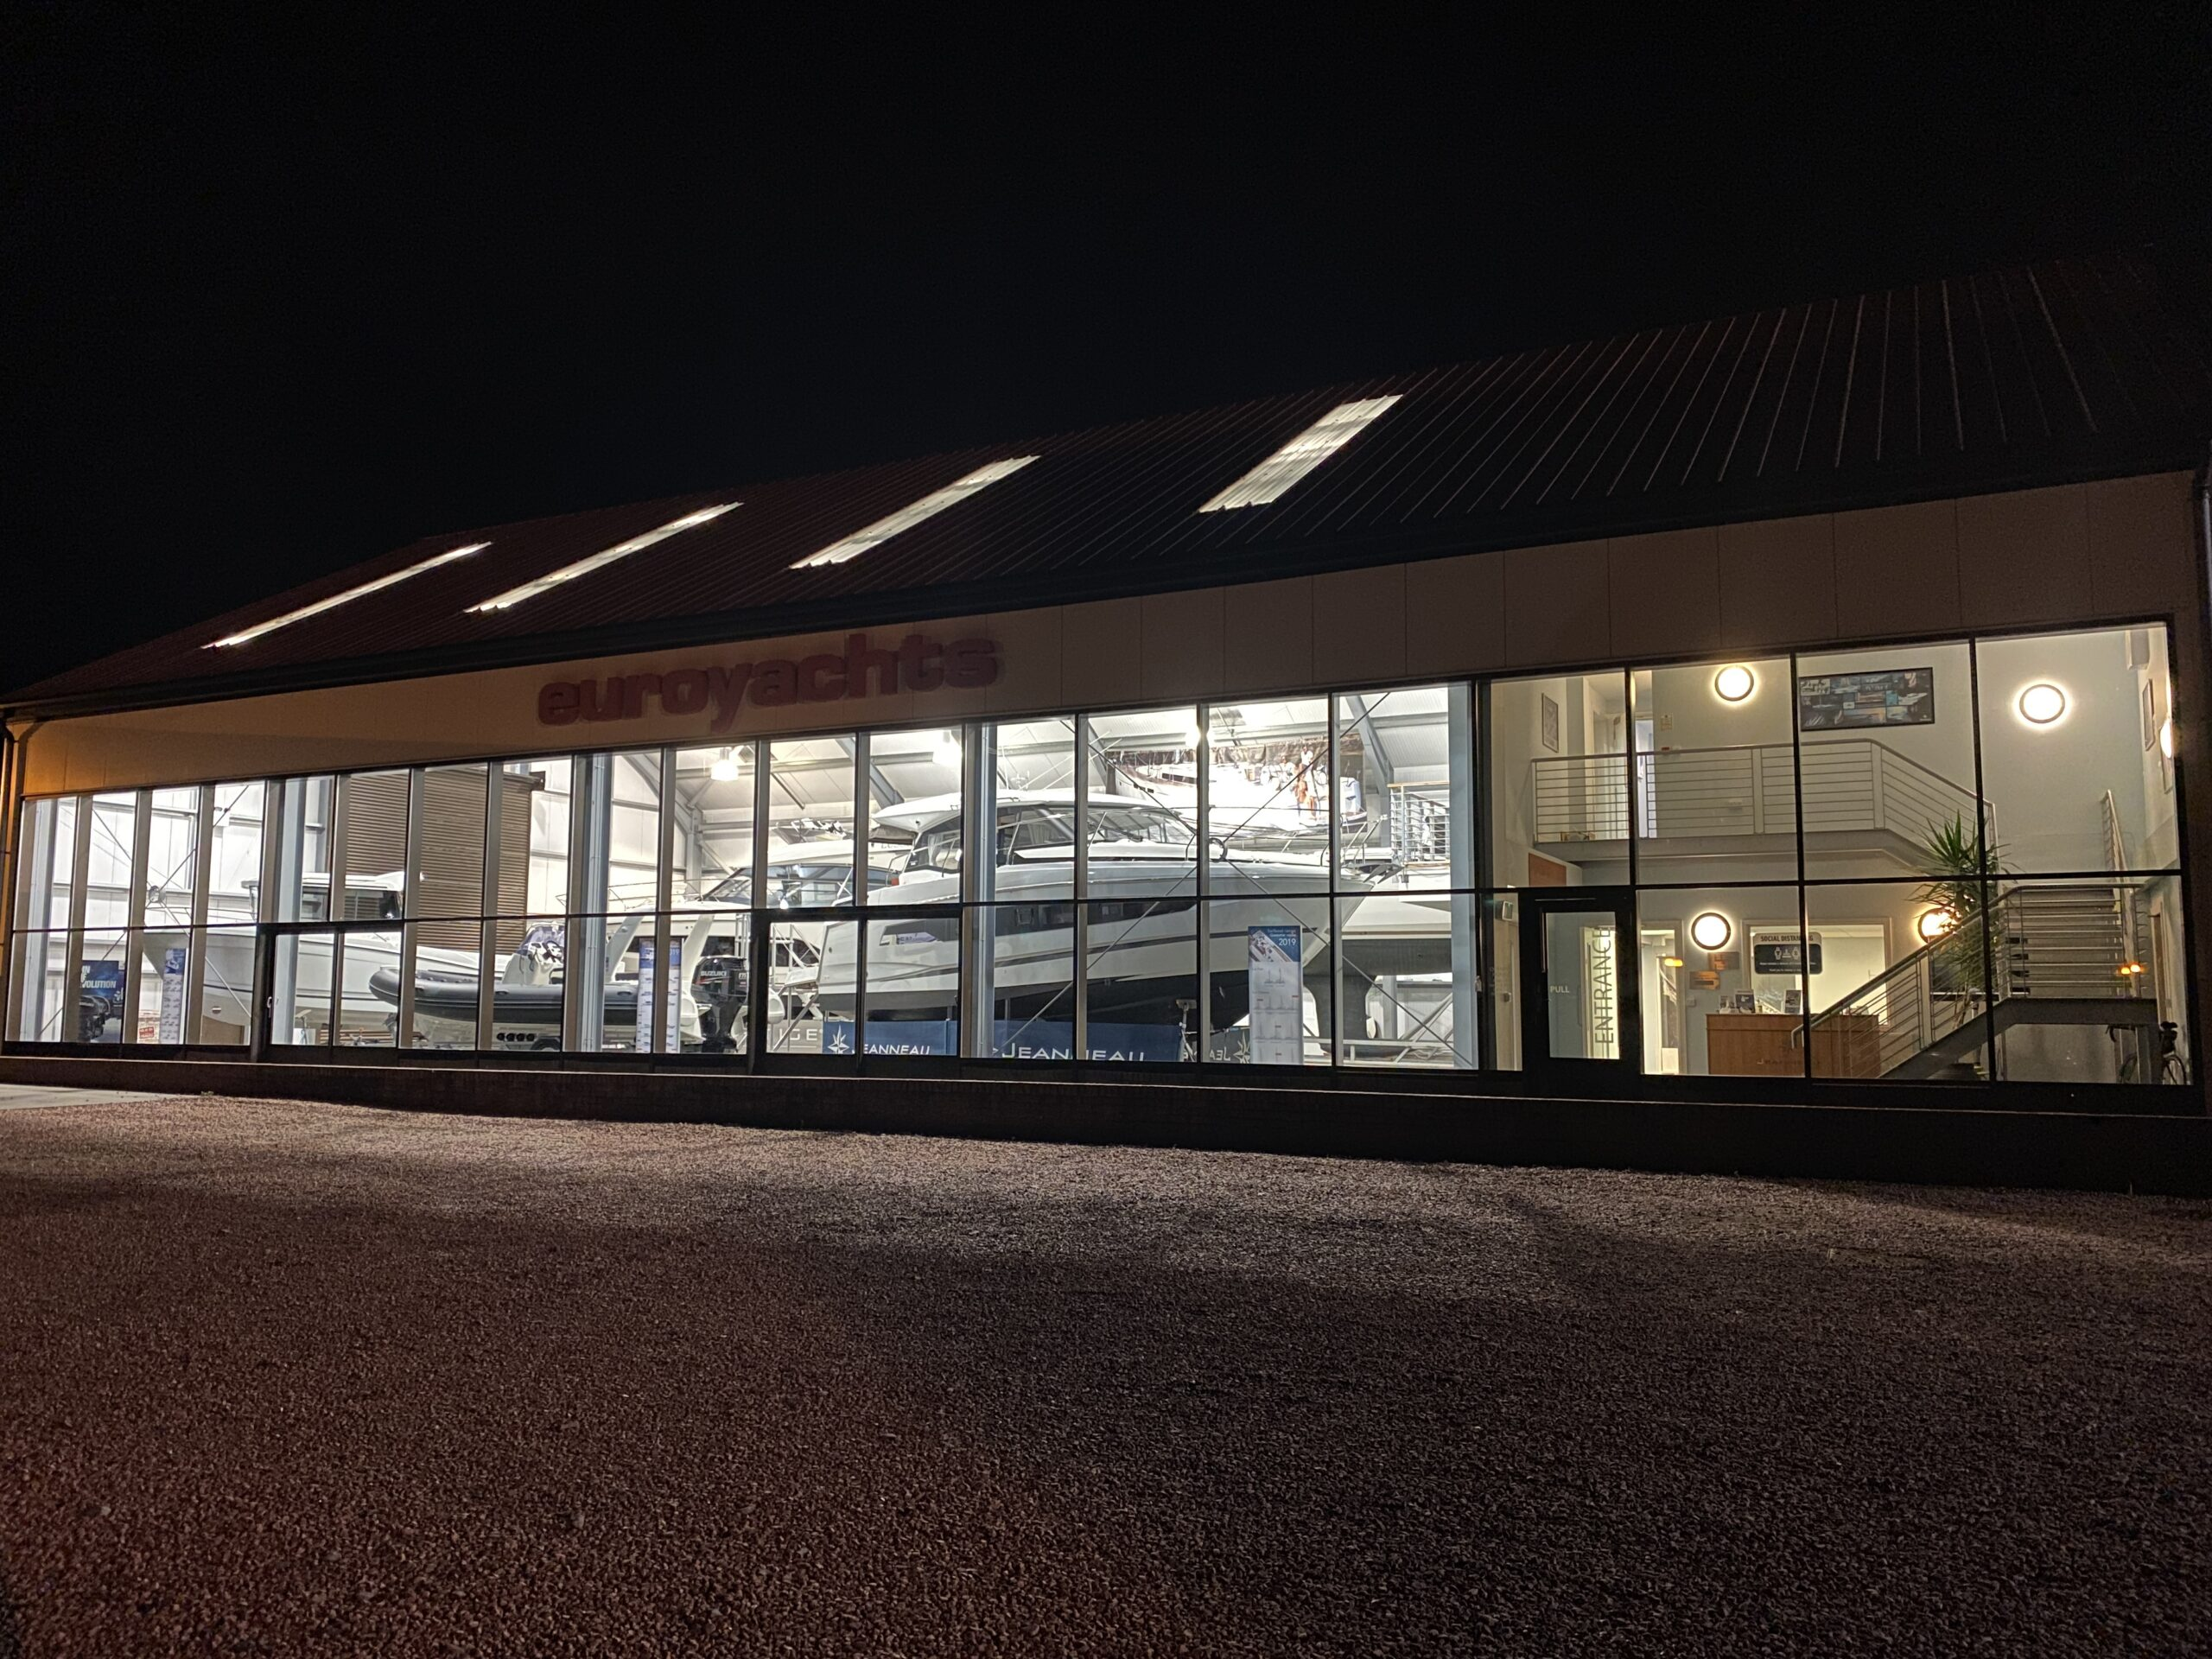 Euroyachts Showroom